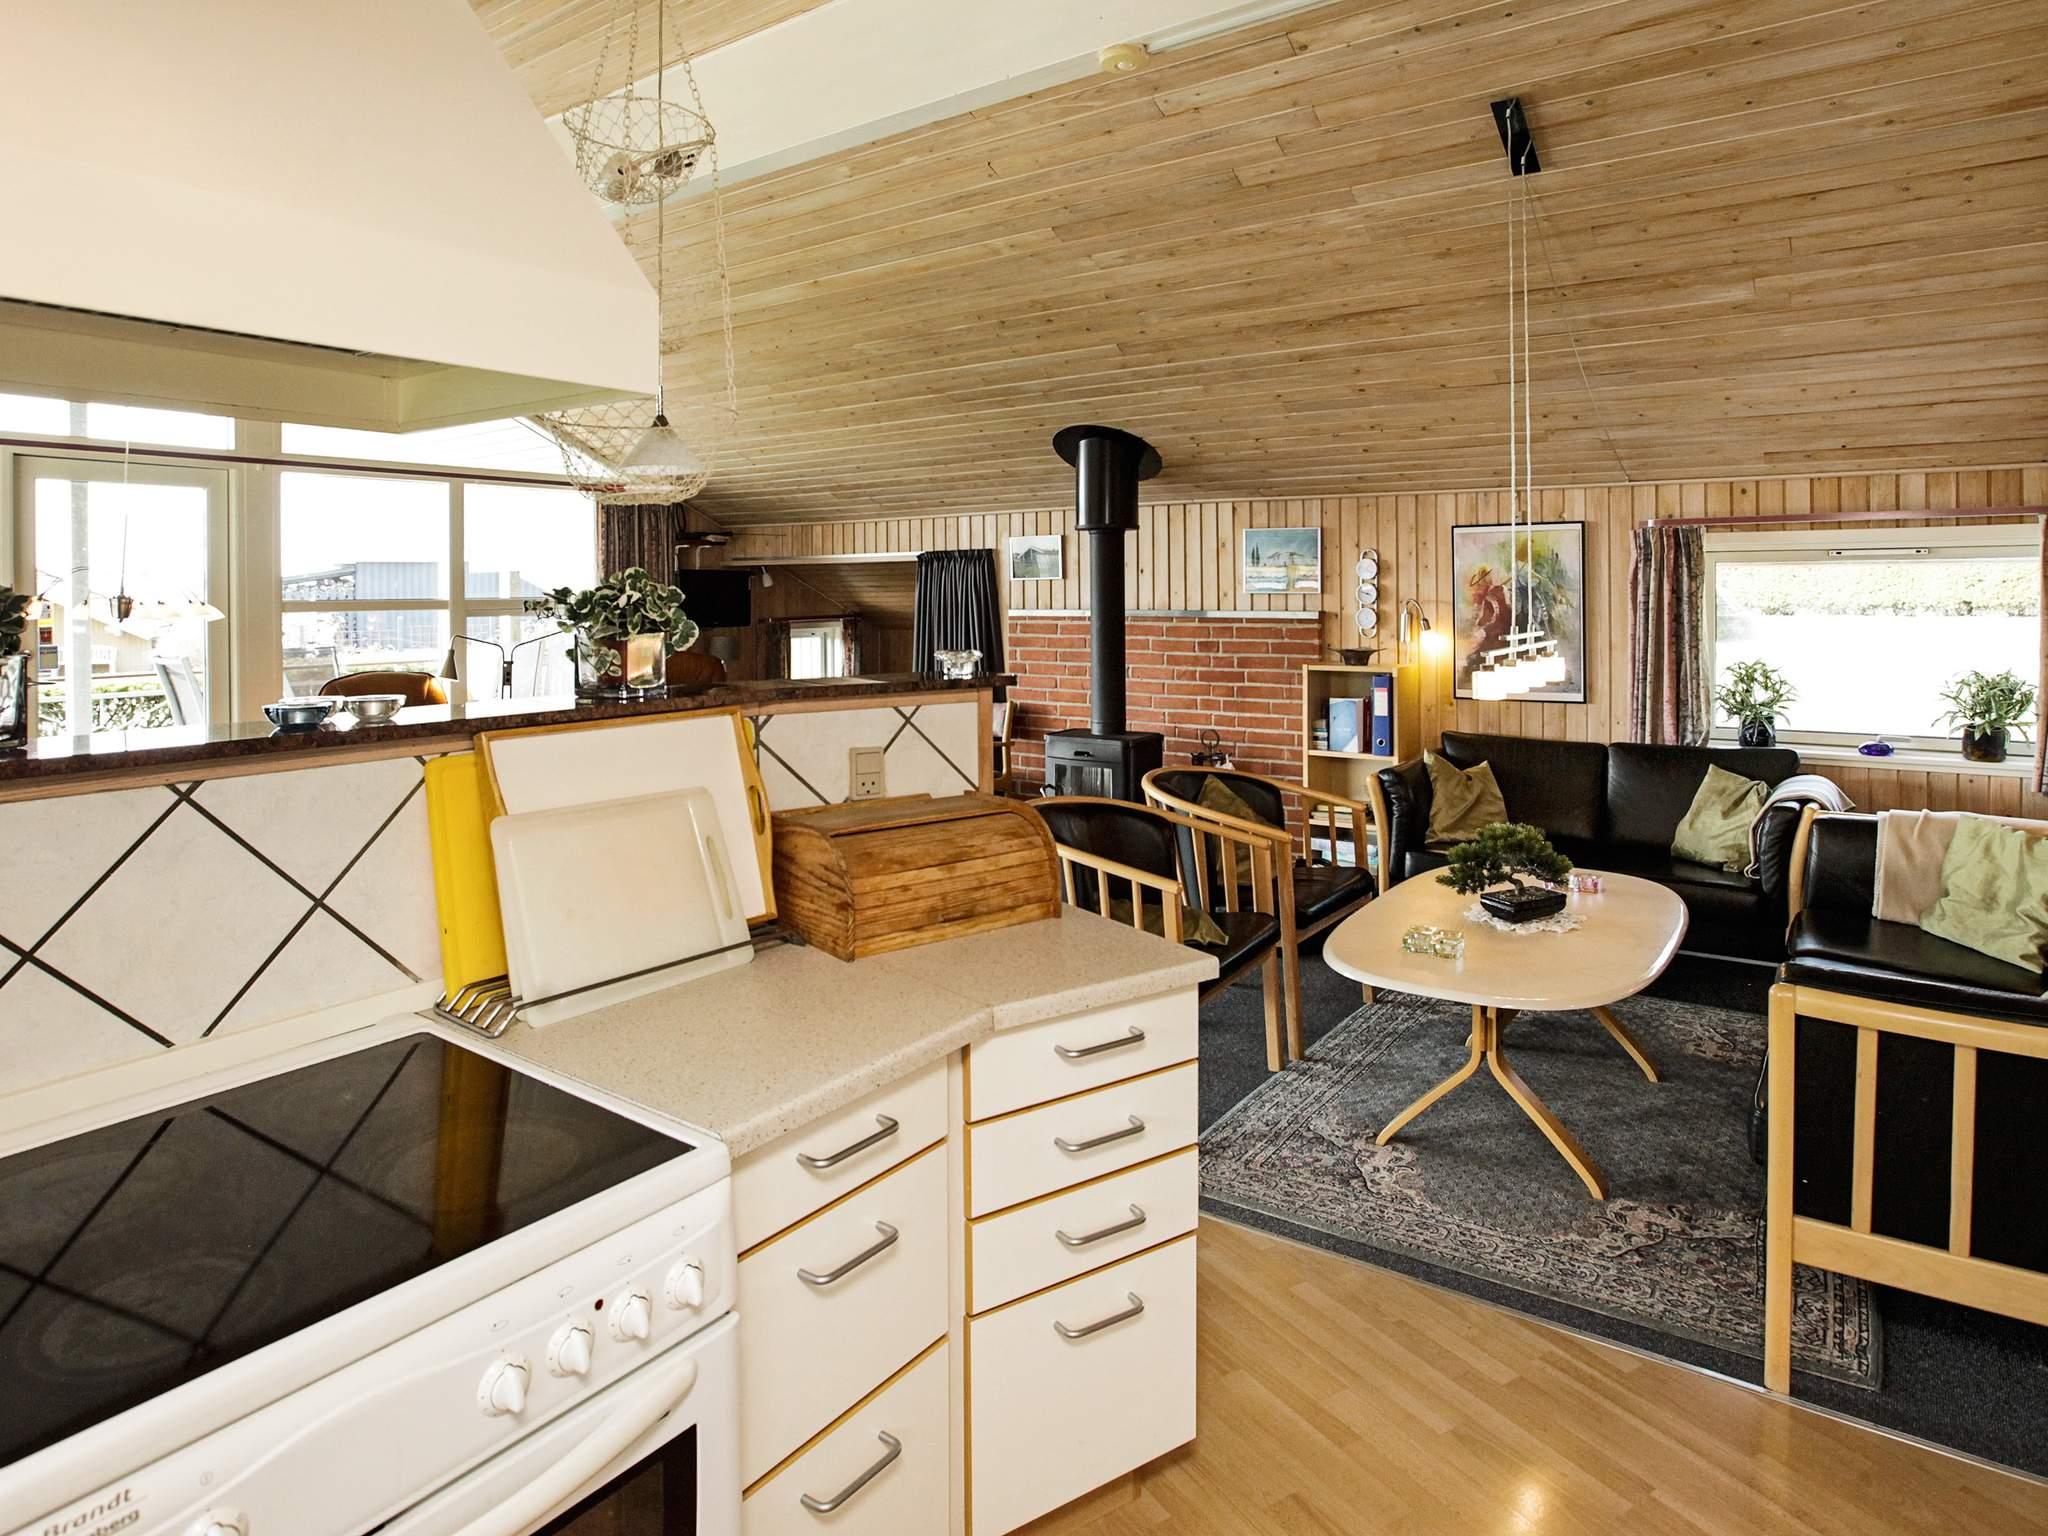 Maison de vacances Falsled (87545), Faldsled, , Fionie, Danemark, image 9